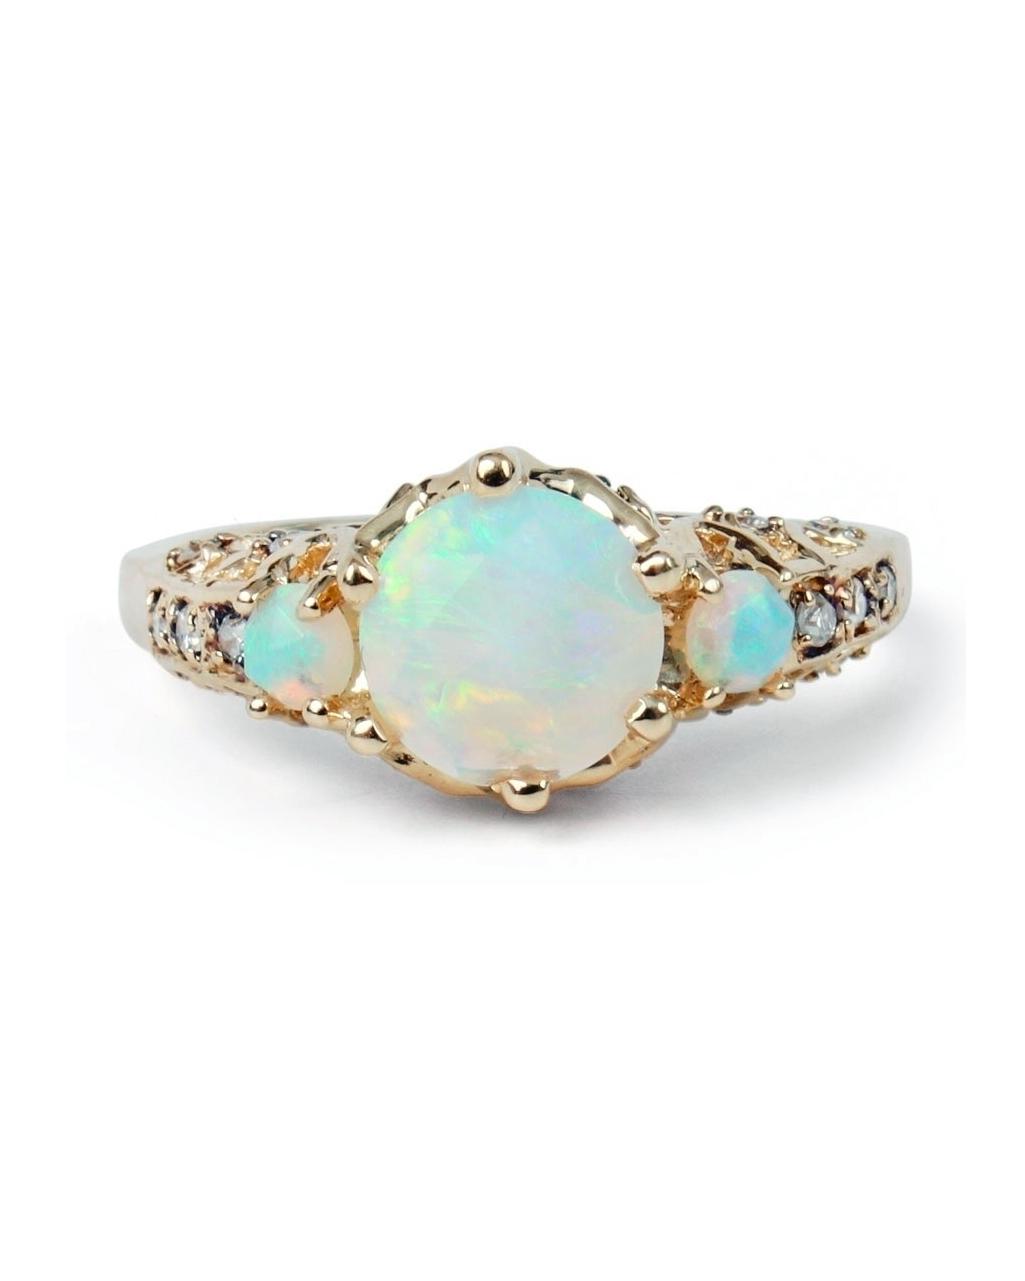 opal-ring-maniamania-catbird-0115.jpg